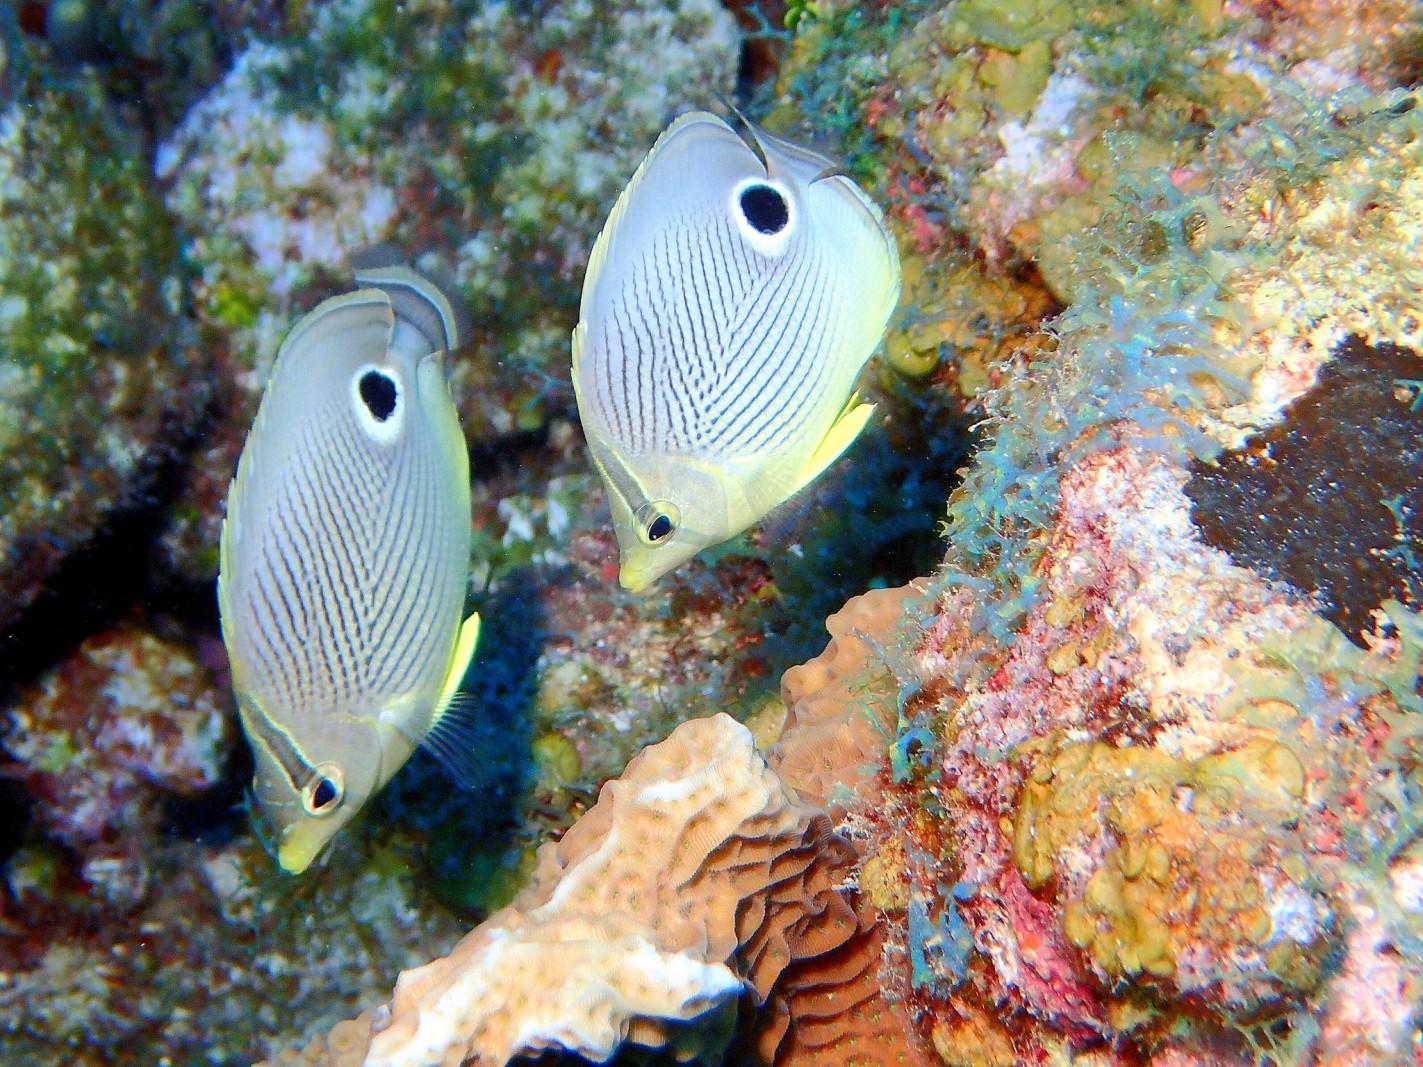 Four-eye Butterflyfish, Chaetodon capistratus